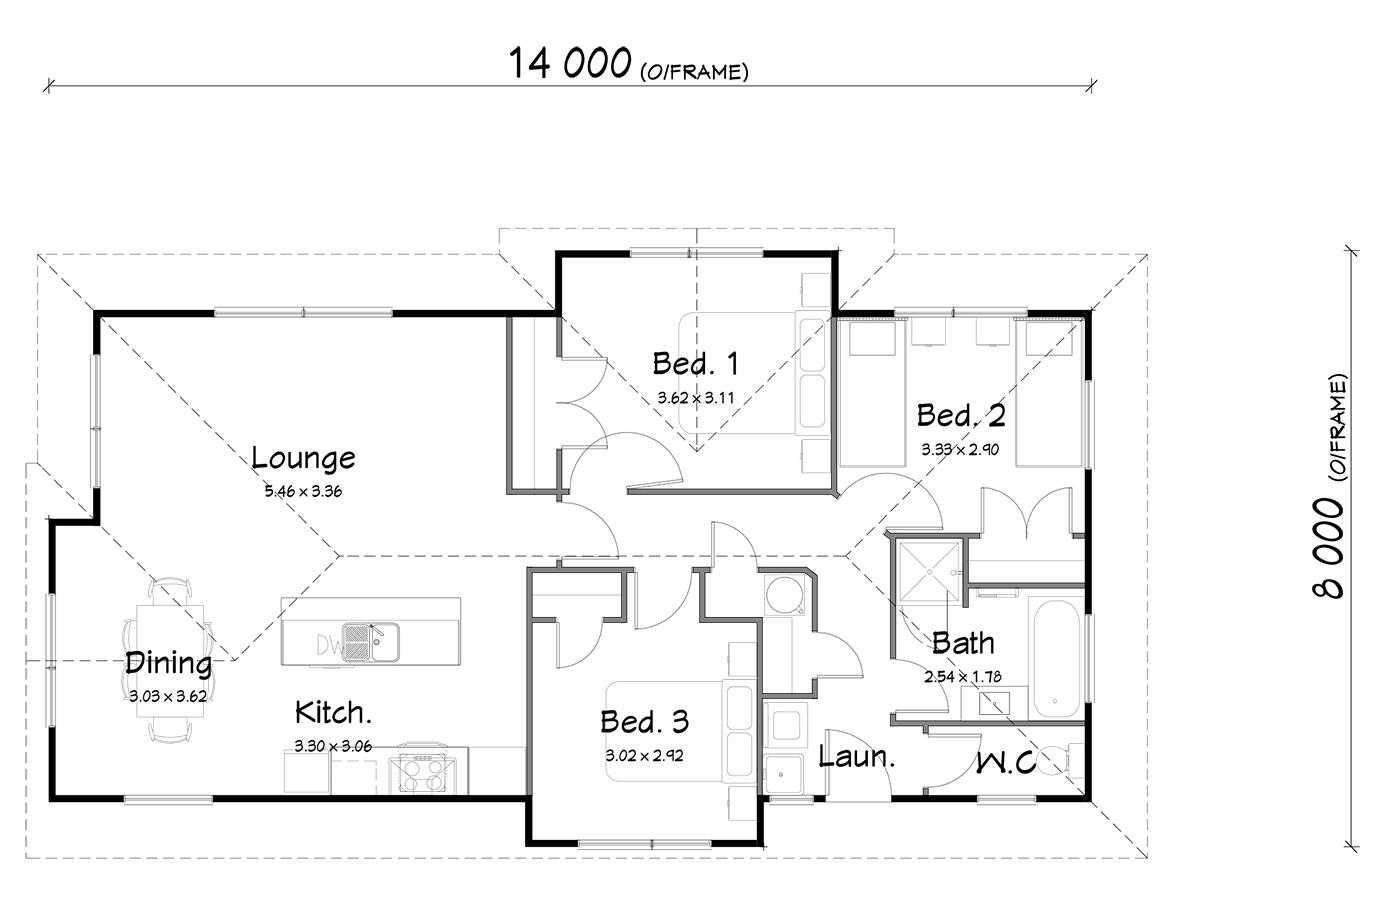 FH96 floorplan